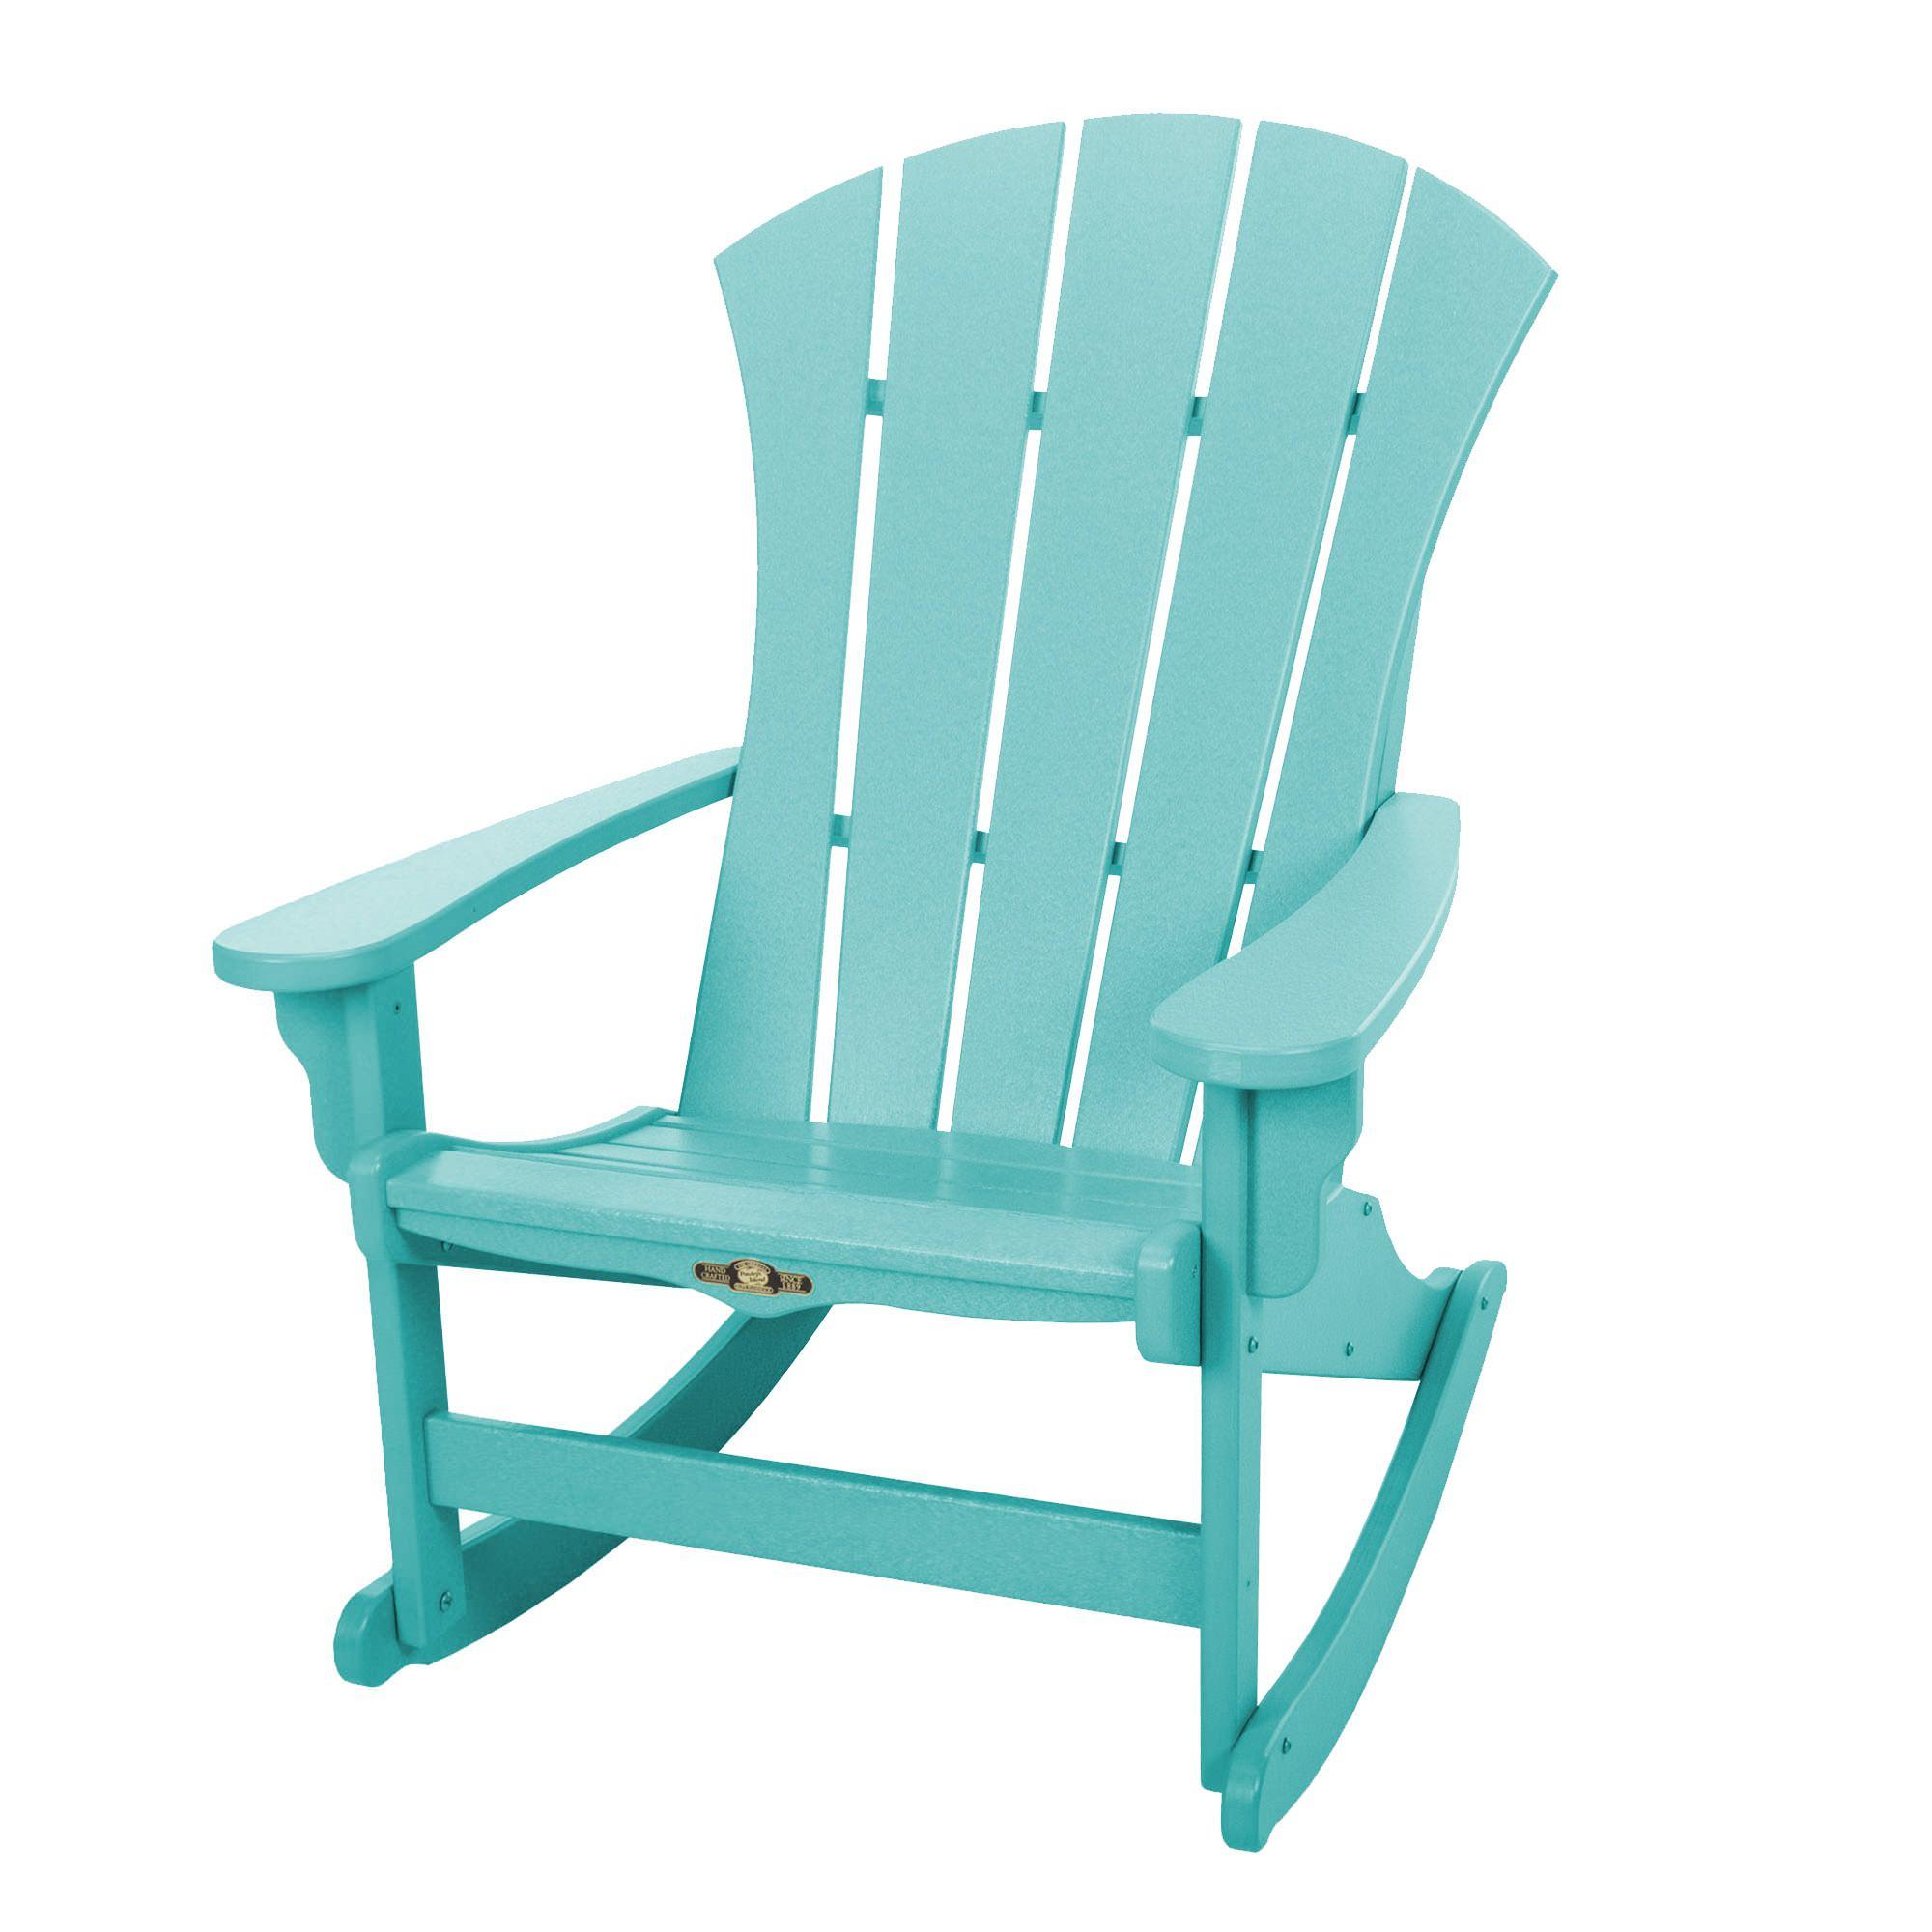 aqua adirondack chairs rental for sale shop durawood sunrise rockers on